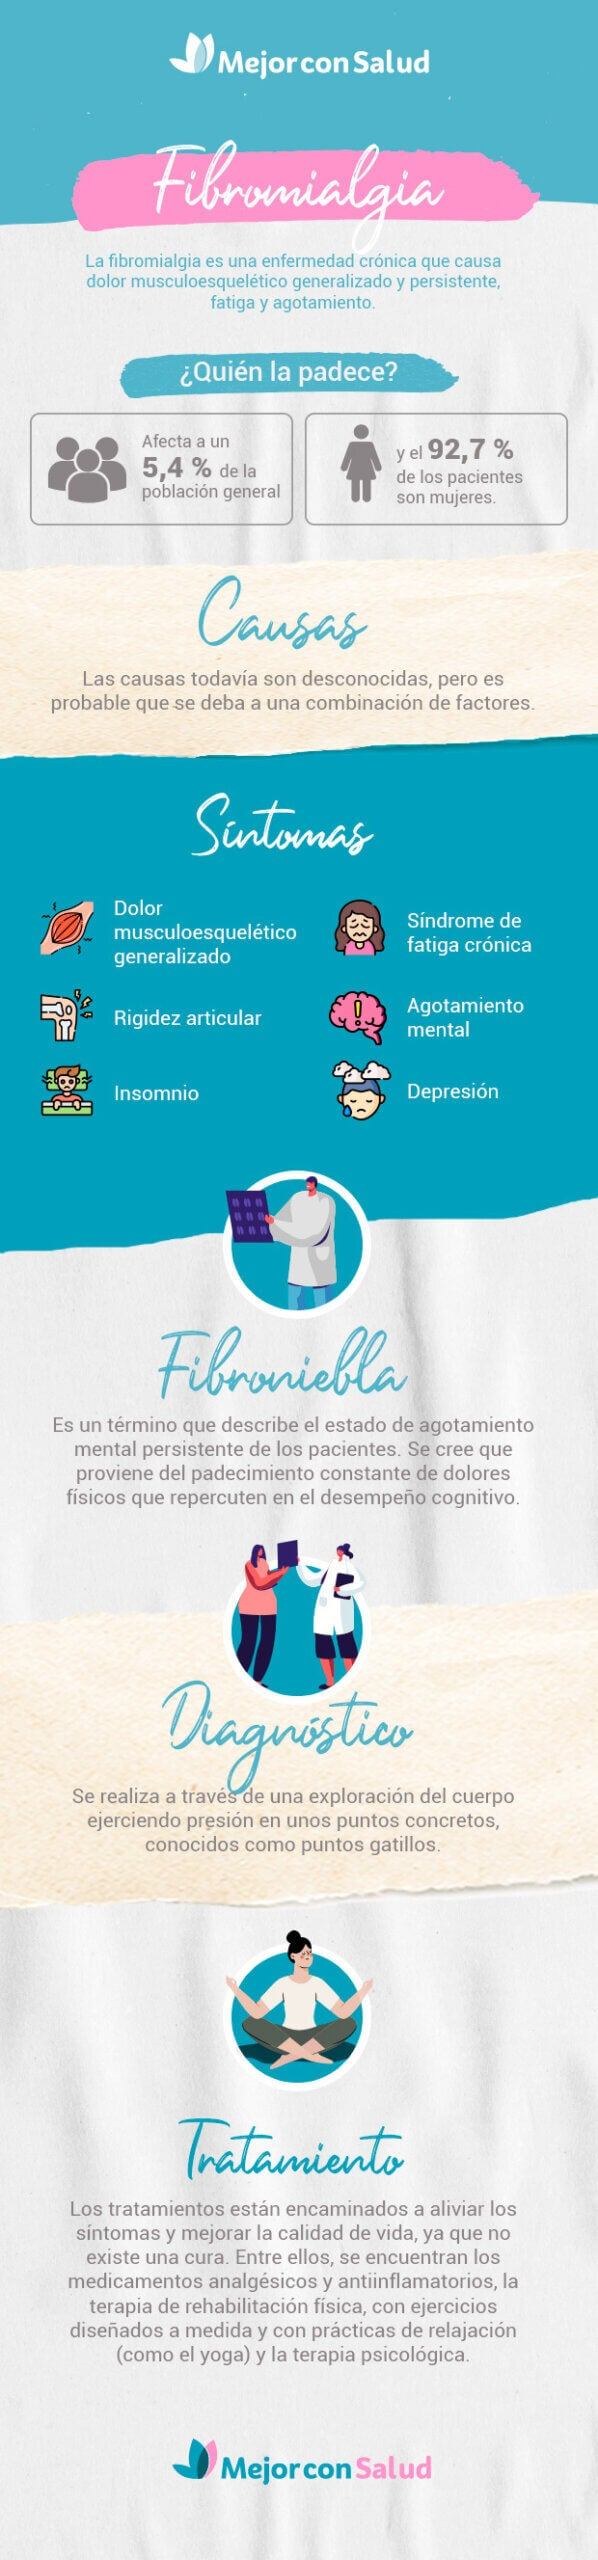 Infografía sobre la fibromialgia